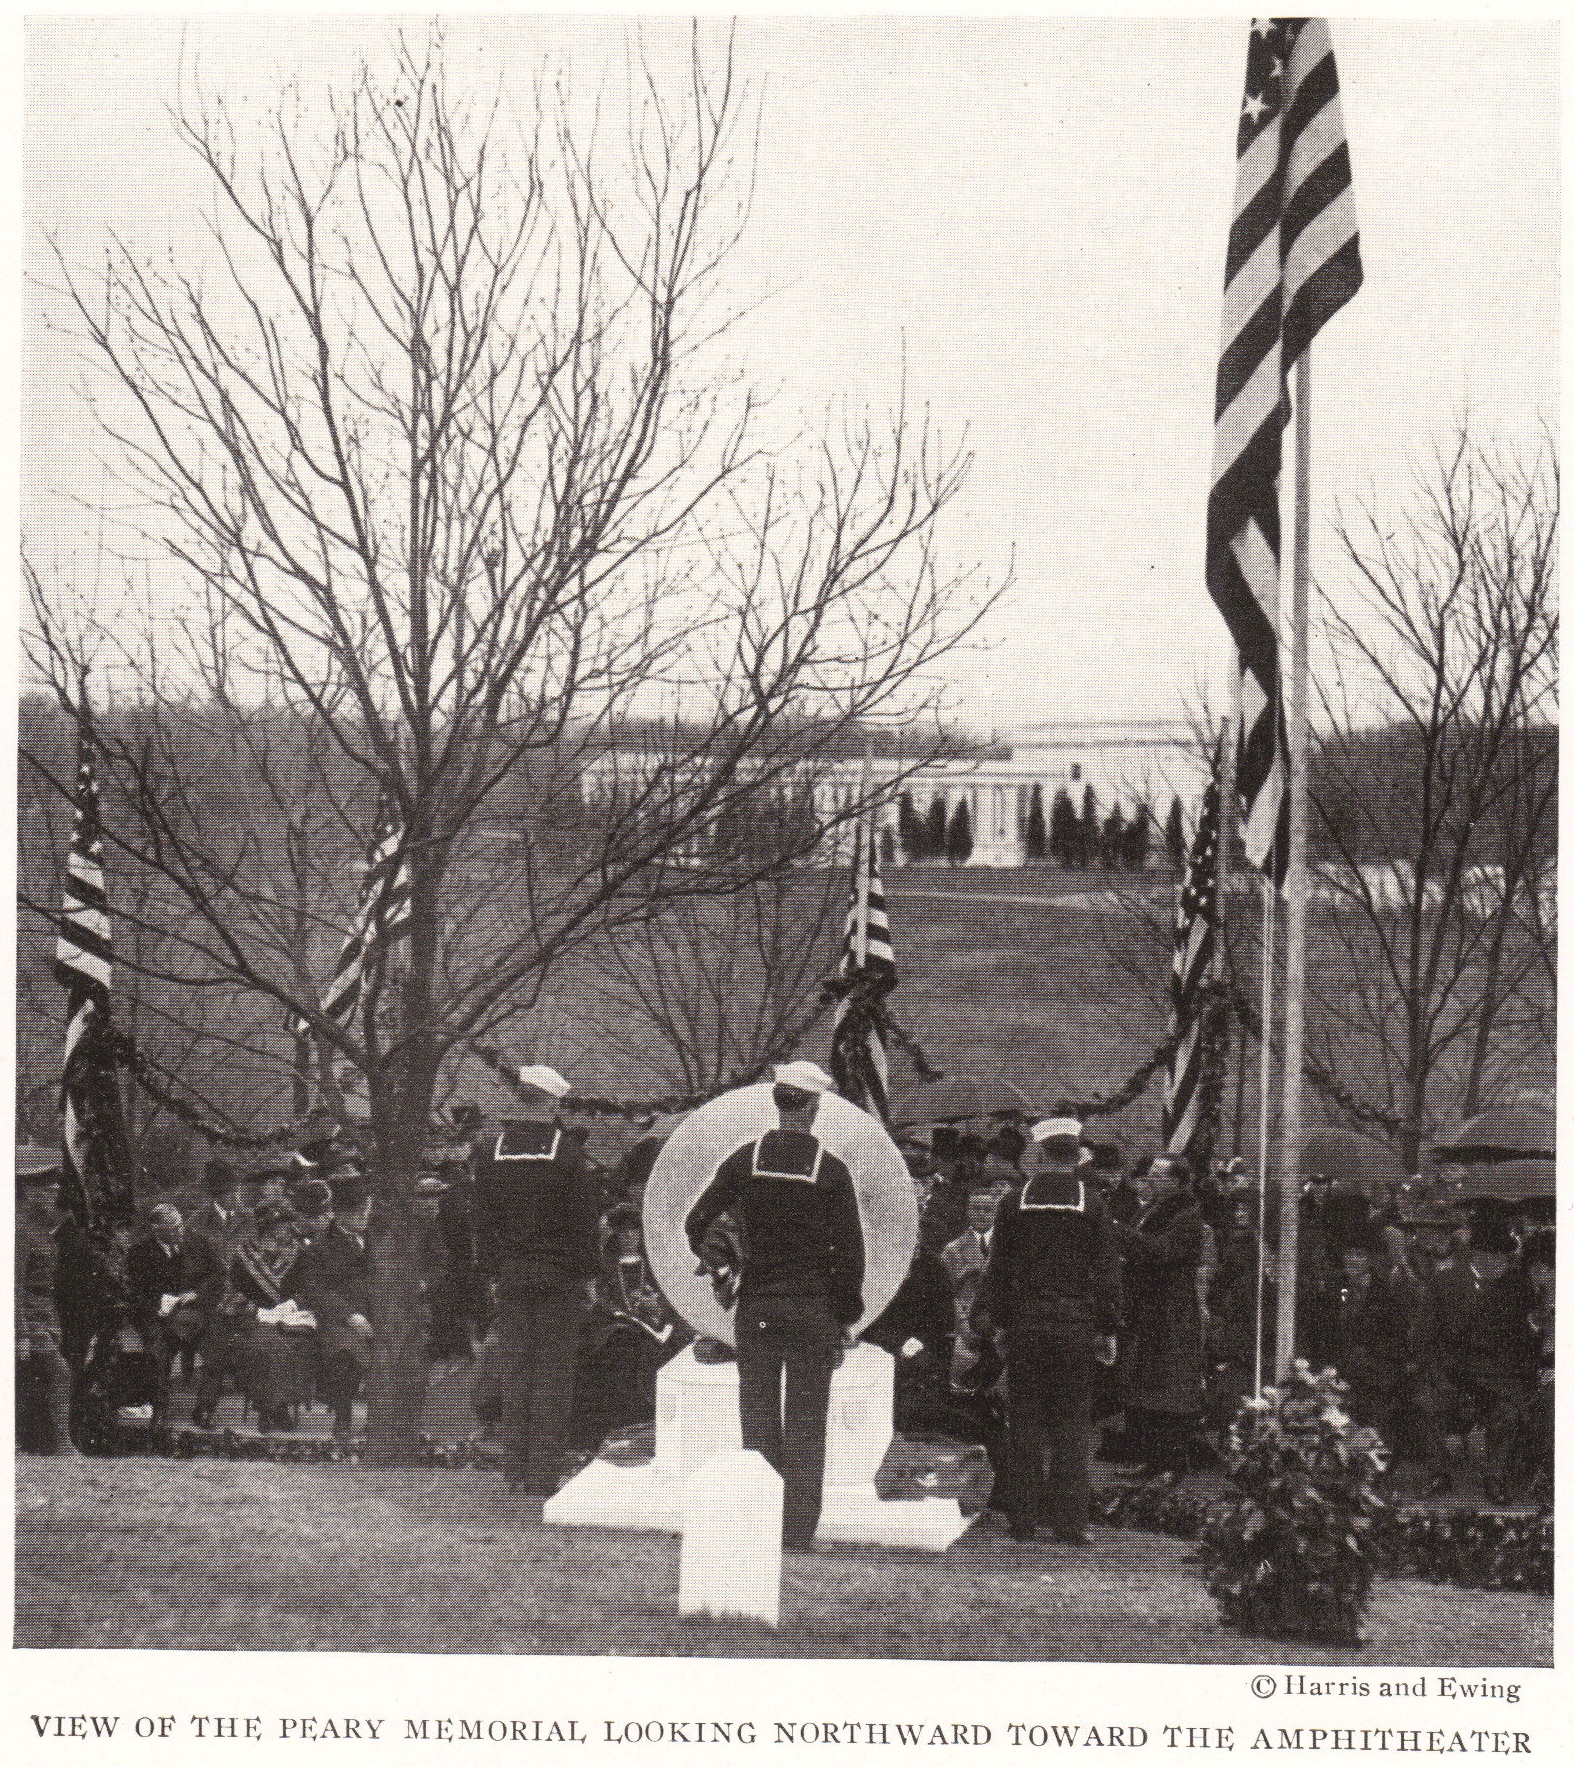 Robert E. Peary (1856-1920) Memorial at Arlington National Cemetery